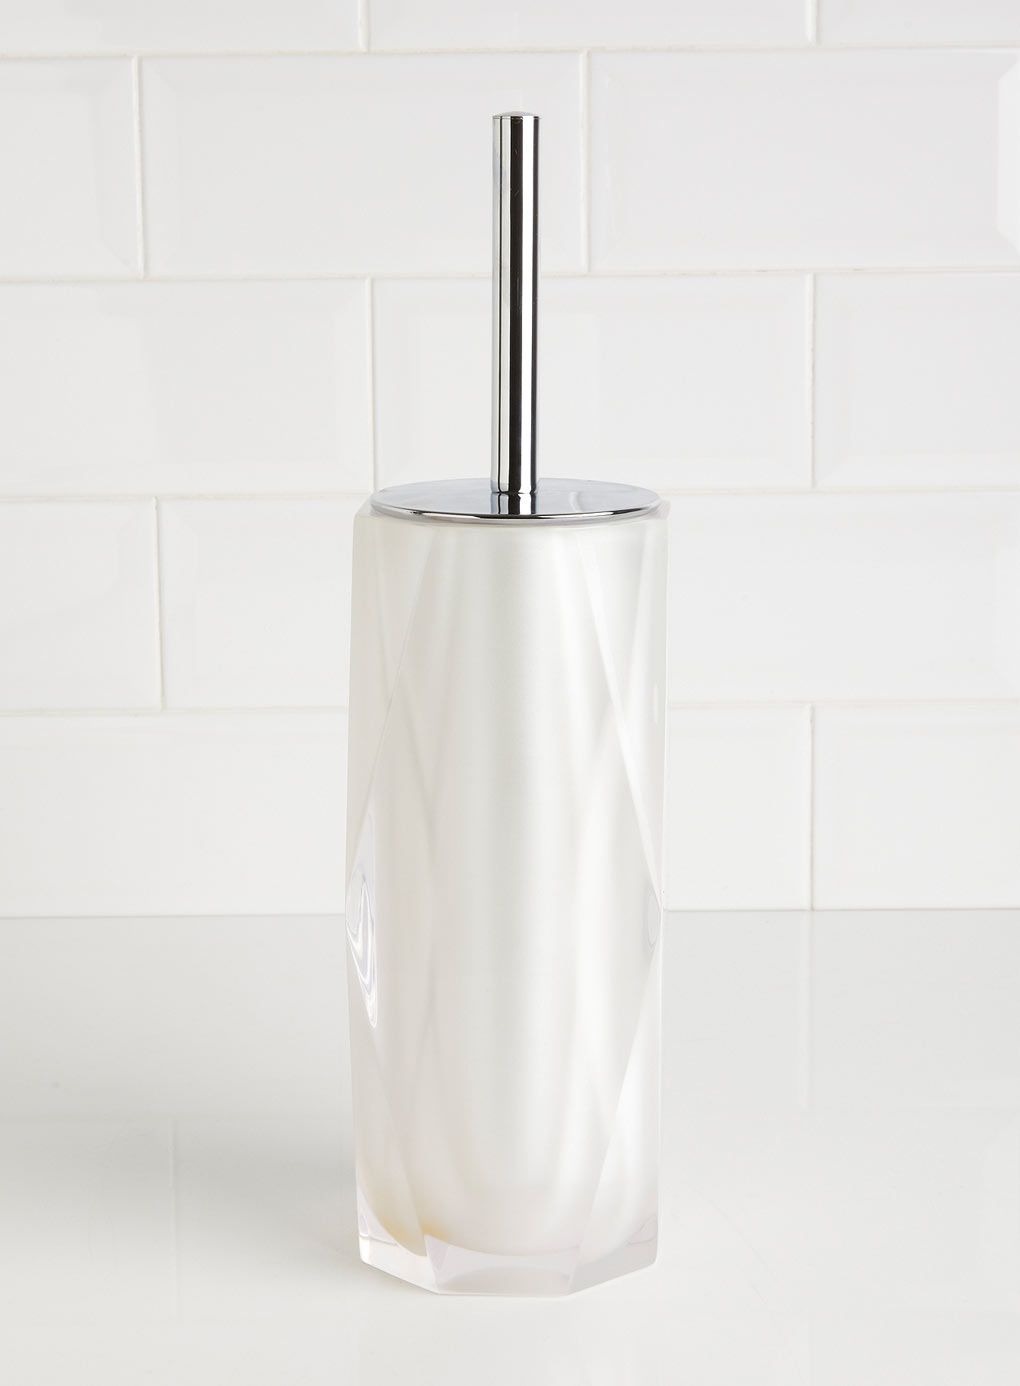 Pearl faceted toilet brush | Bathrooms | Pinterest | Toilet brush ...